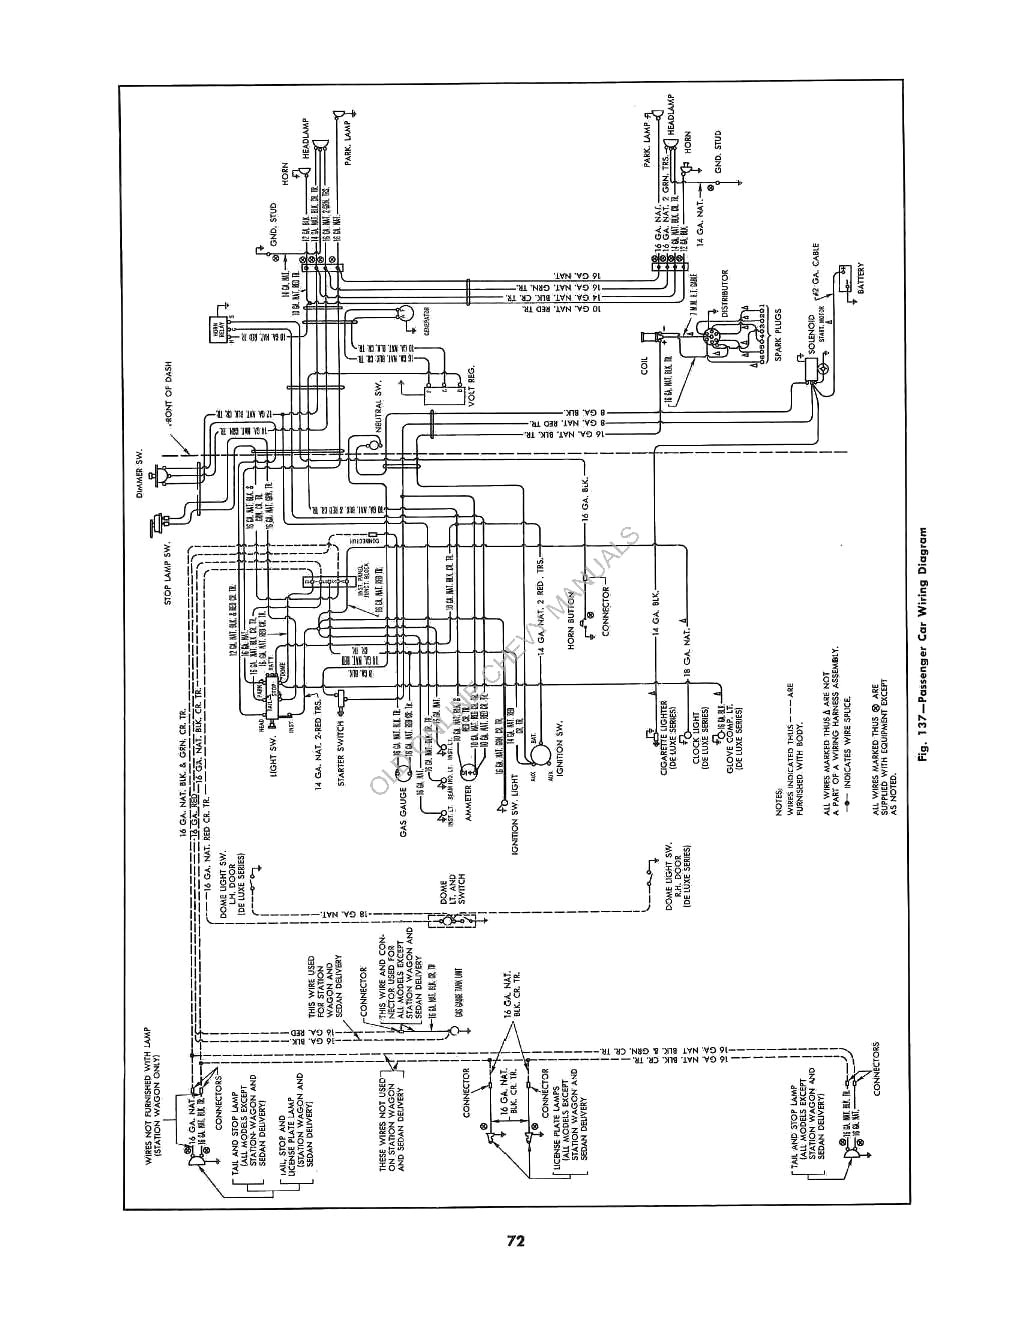 1950 chevrolet passenger car maintenance manual